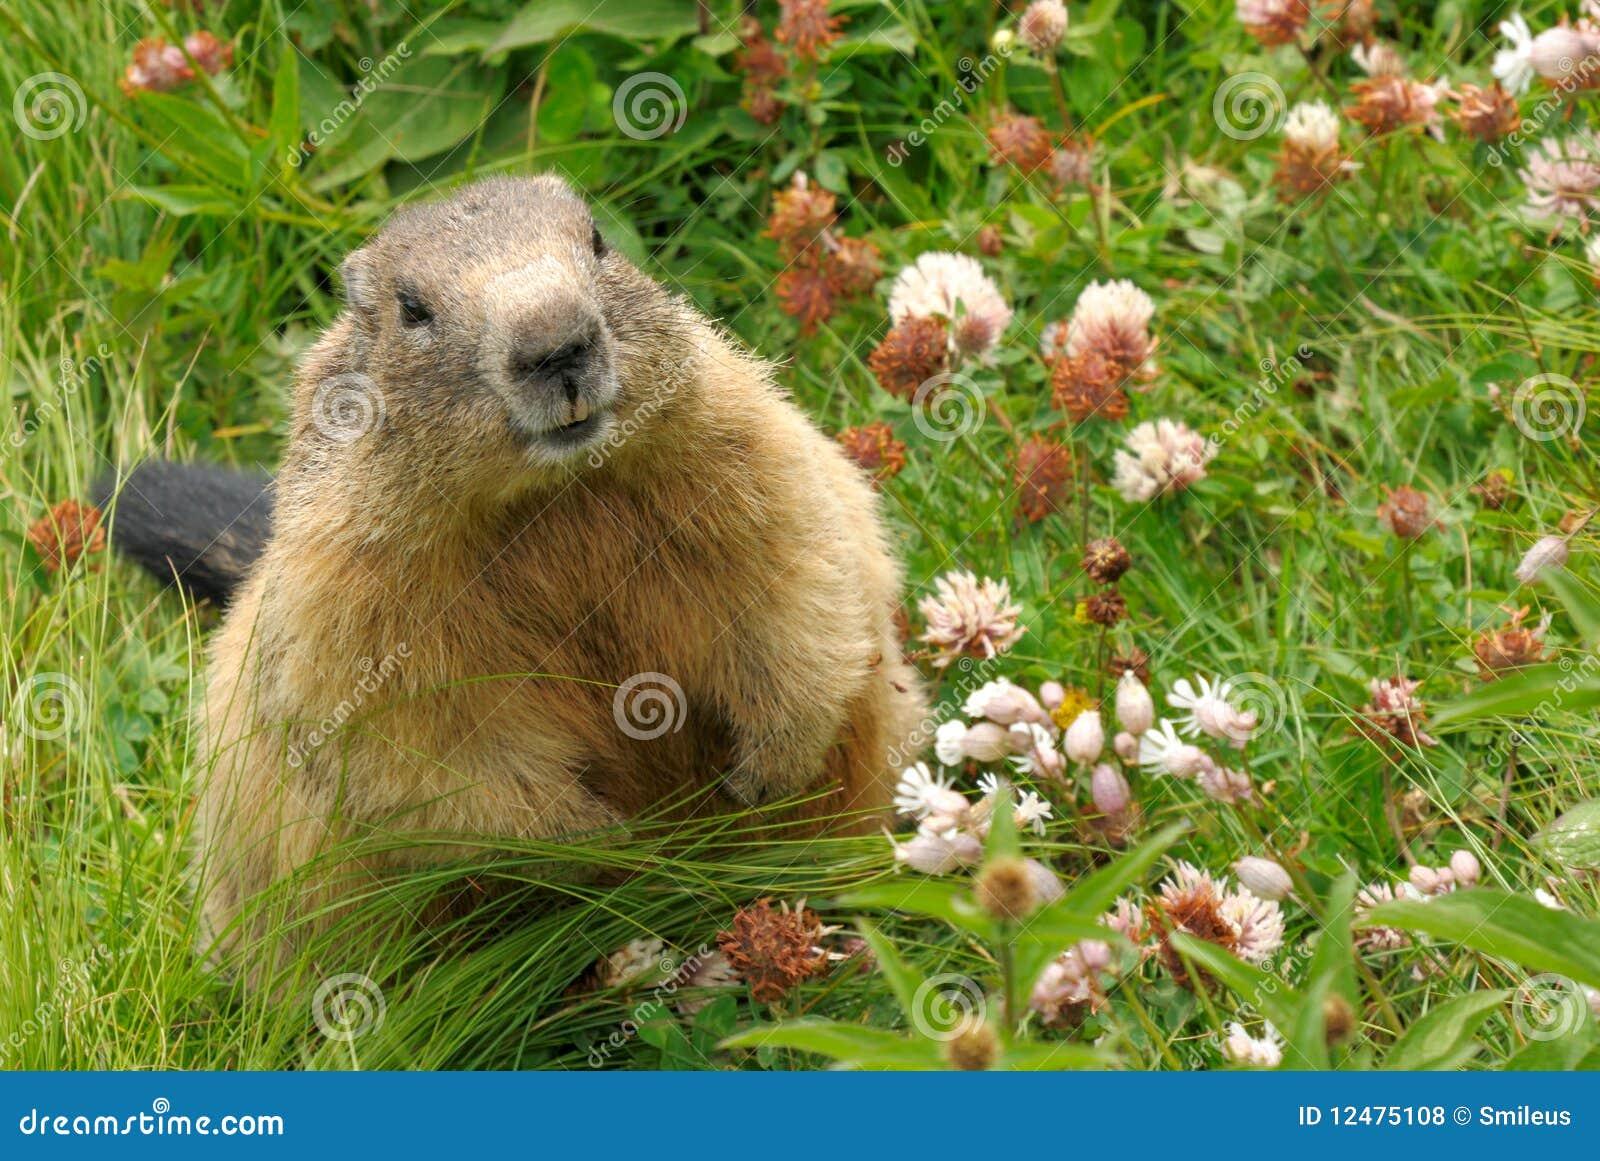 groundhog in his natural habitat royalty free stock photos image